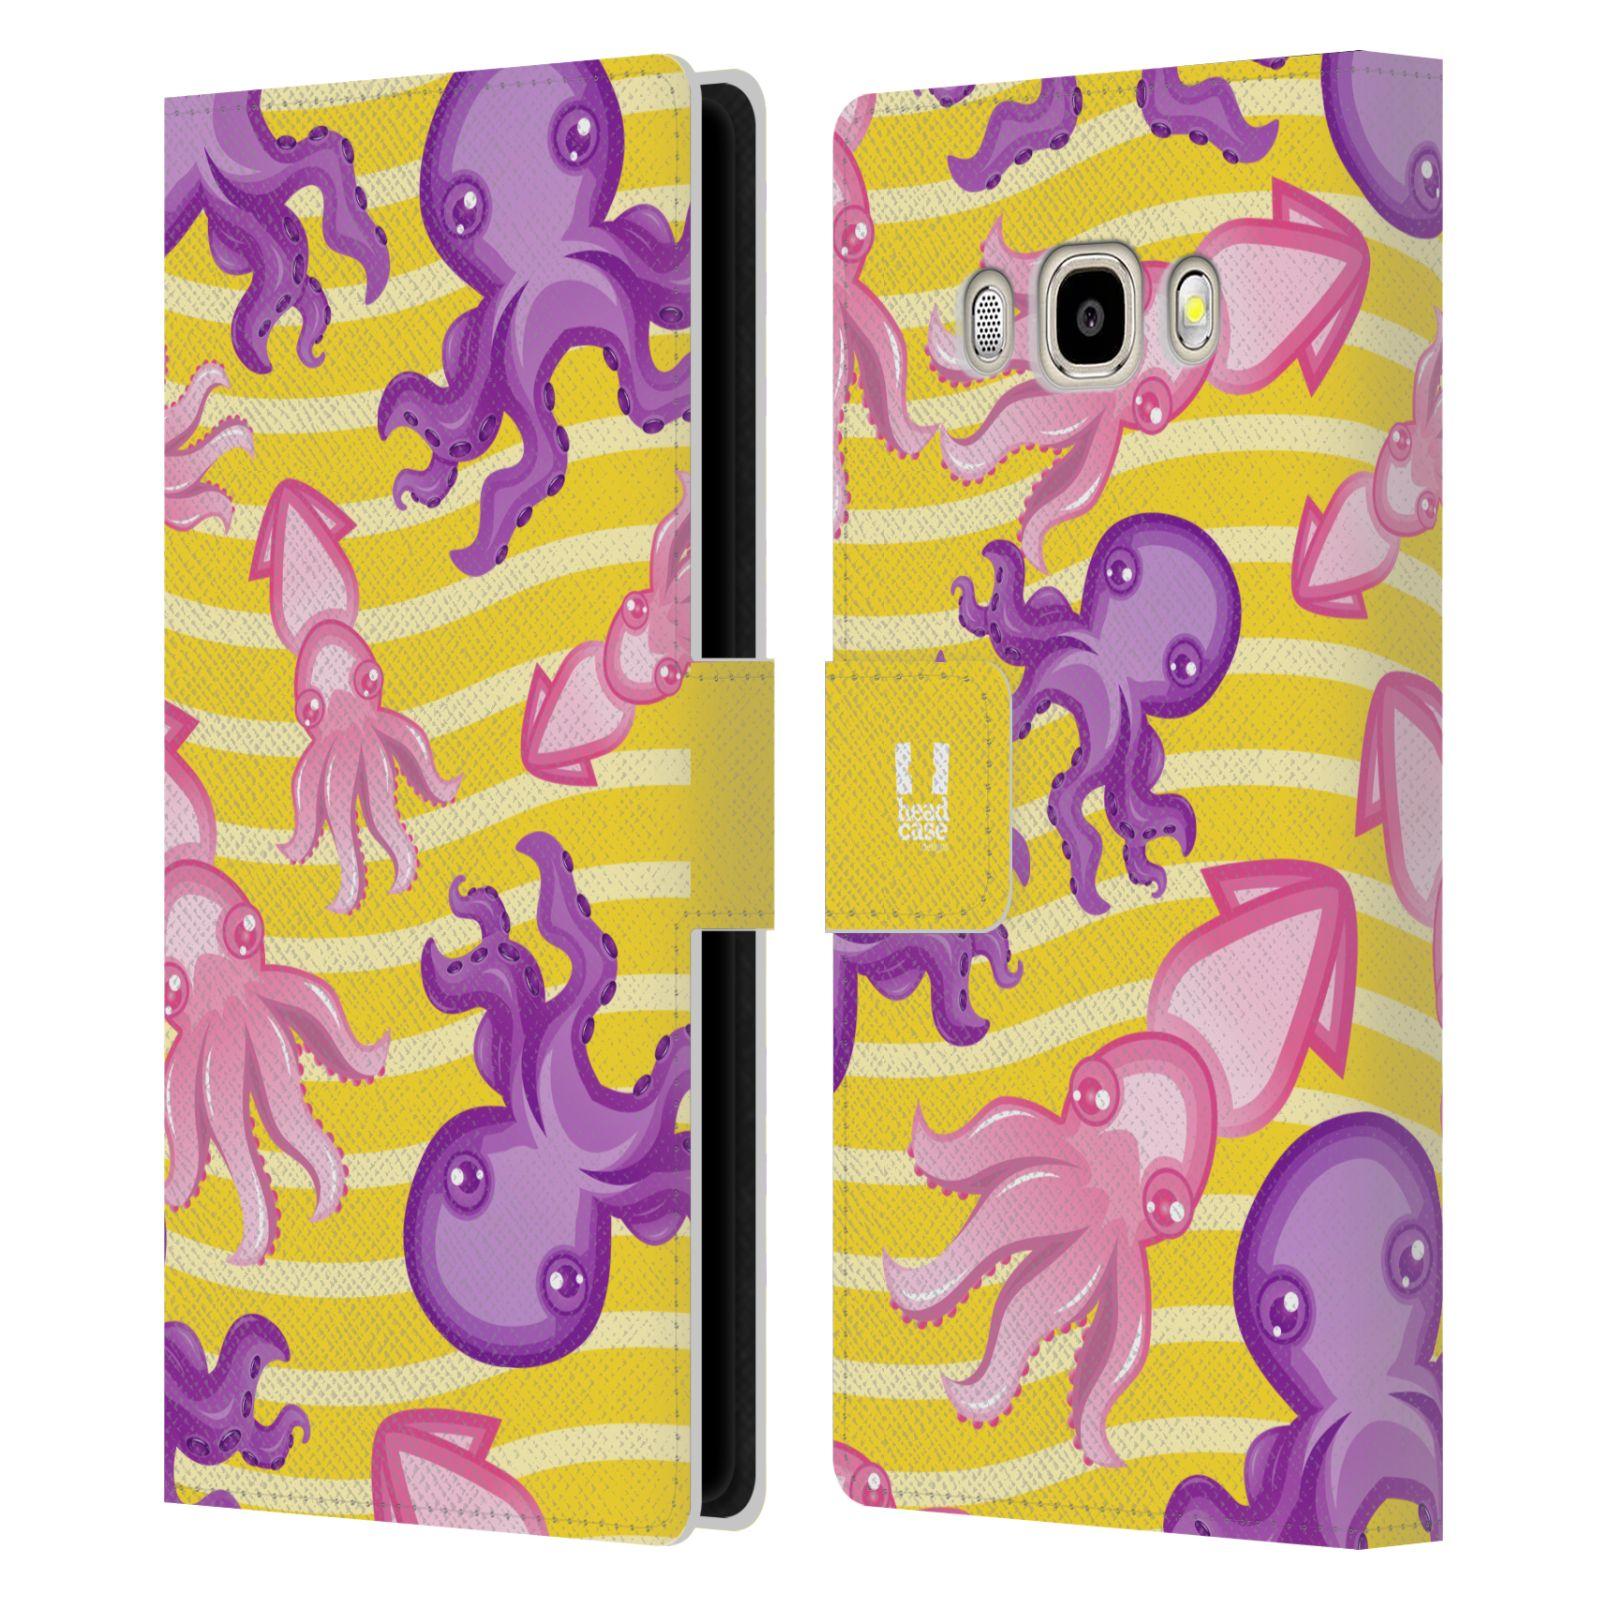 HEAD CASE Flipové pouzdro pro mobil Samsung Galaxy J5 2016 Mořský živočich chobotnice a krakatice žlutá barva